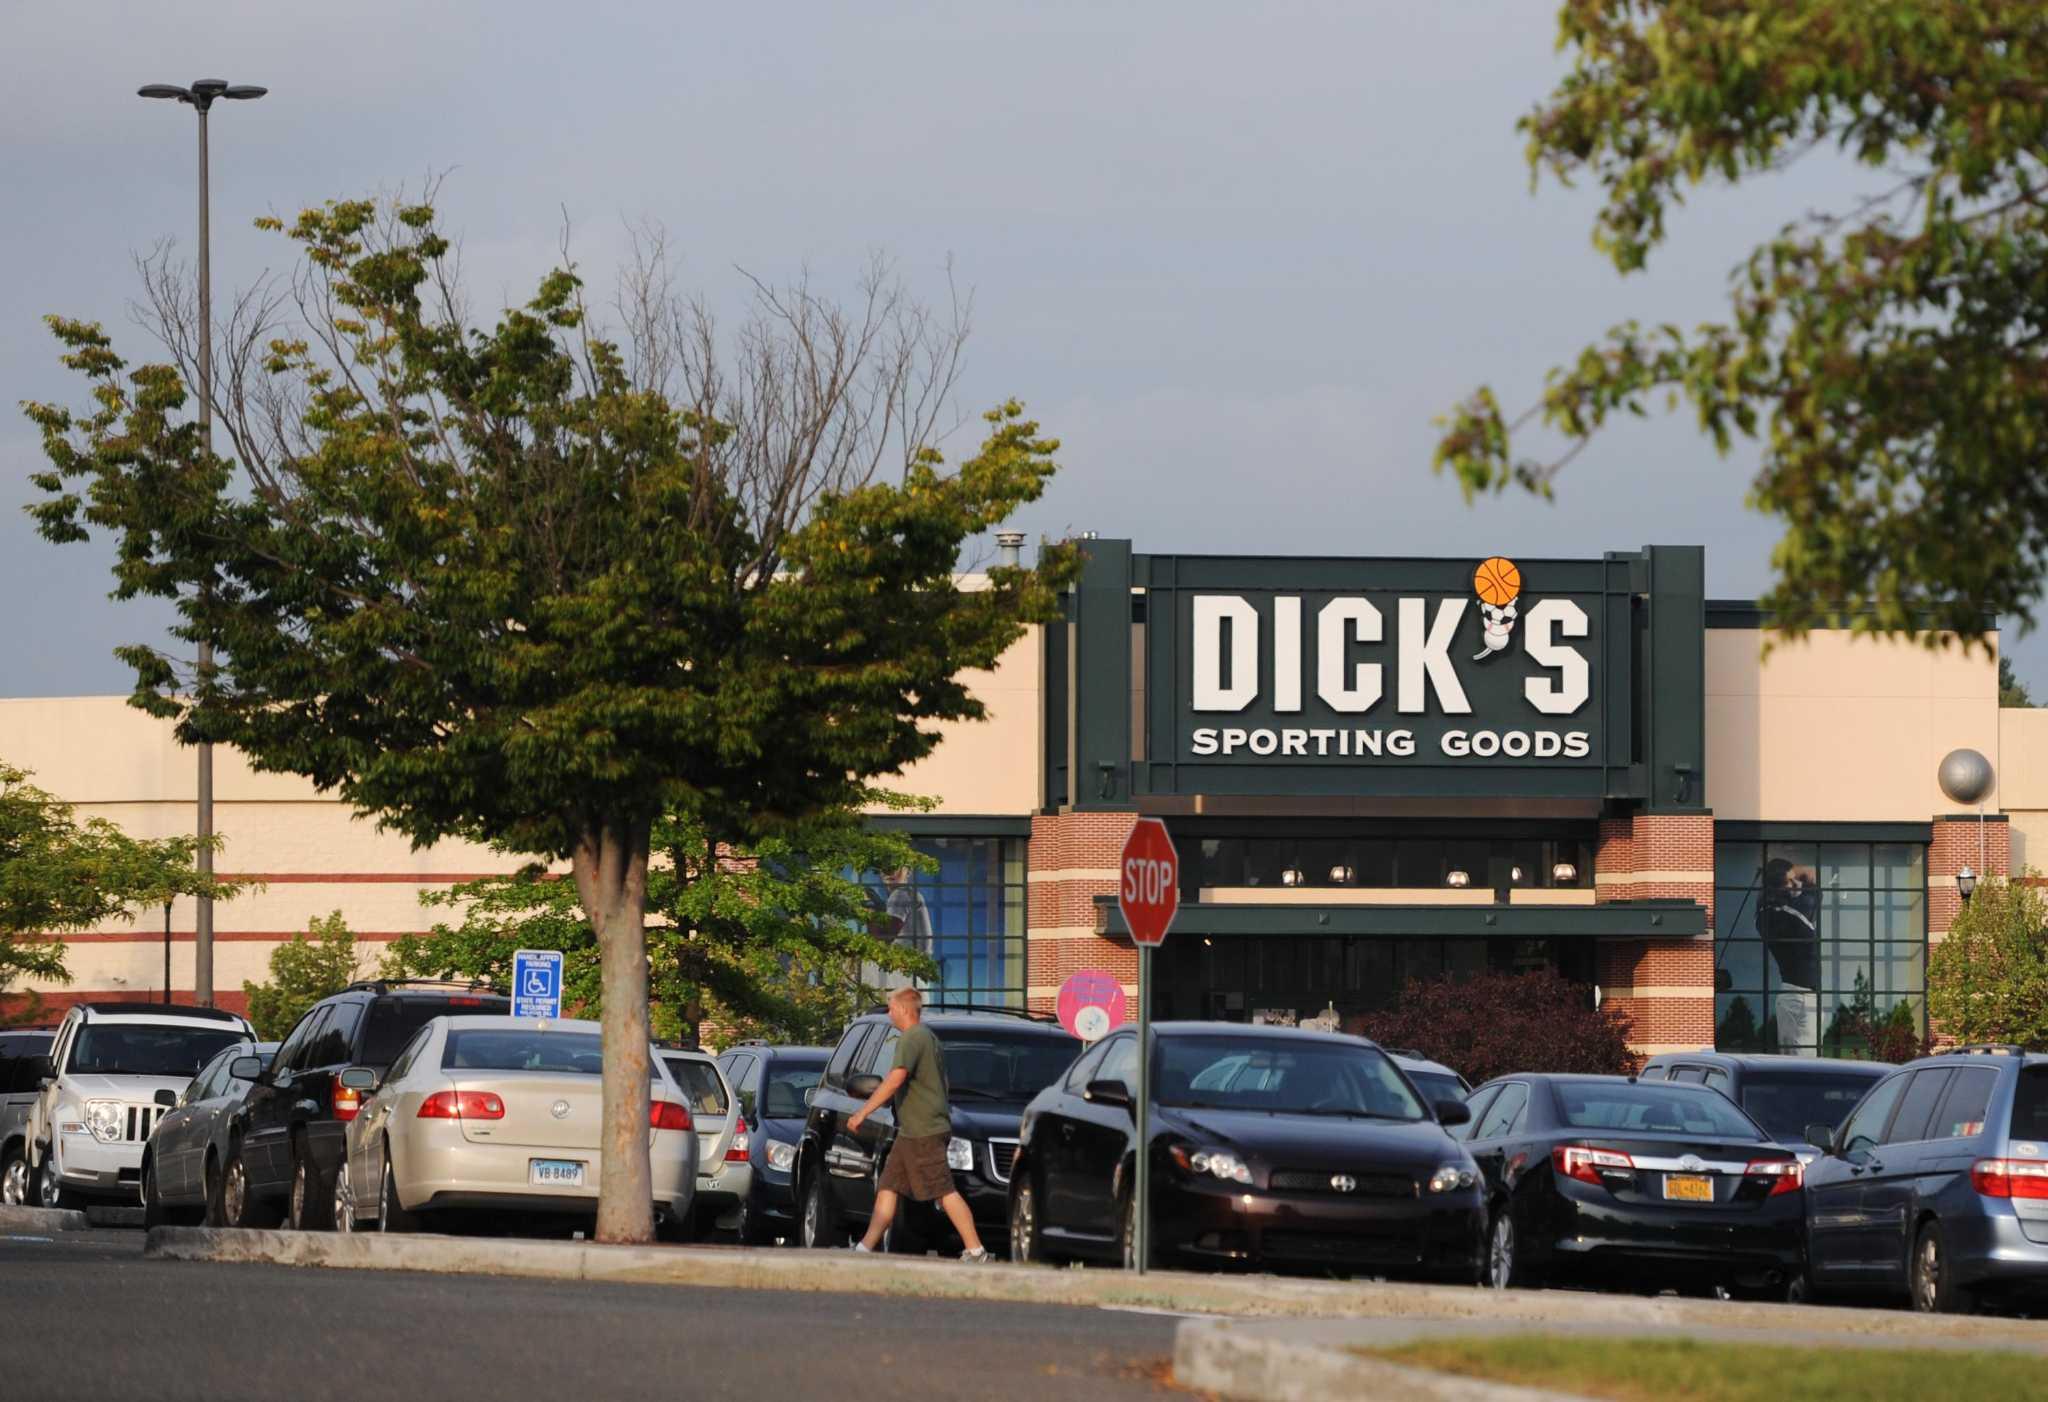 Dicks sporting goods job opportunities